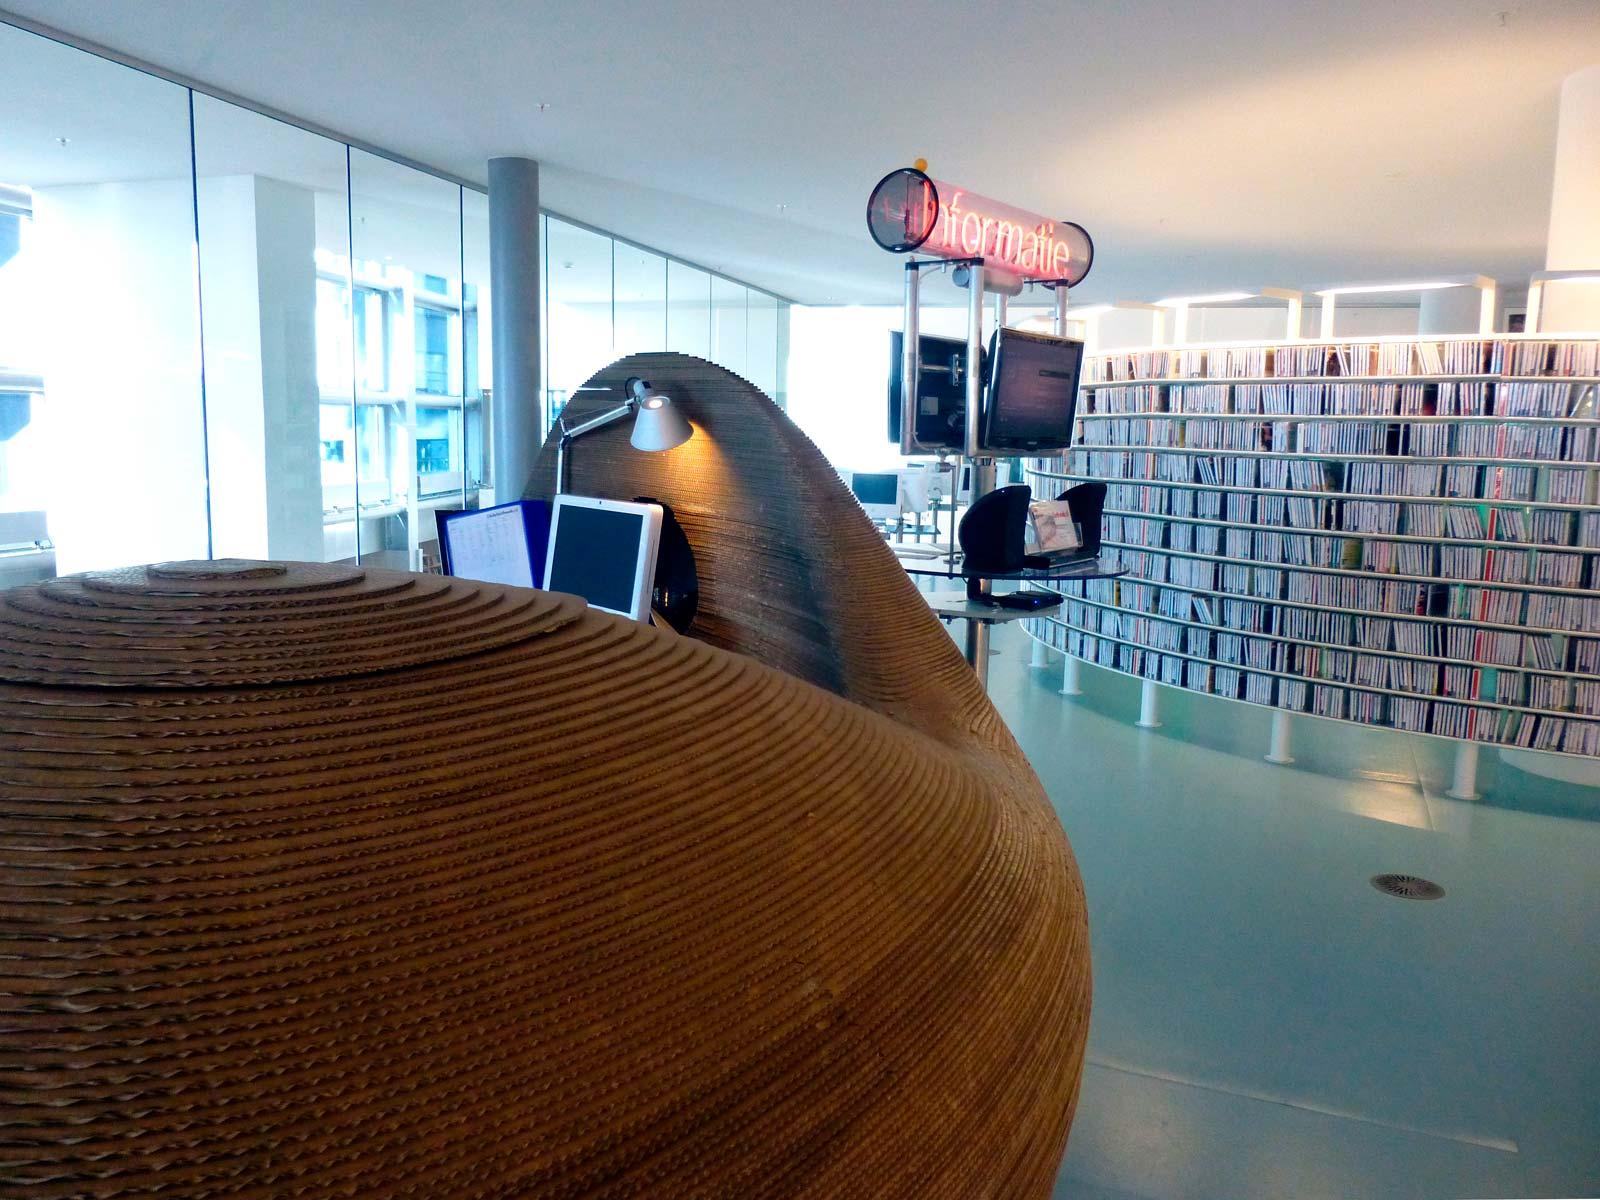 Amsterdam Library Cardboard Desk 3